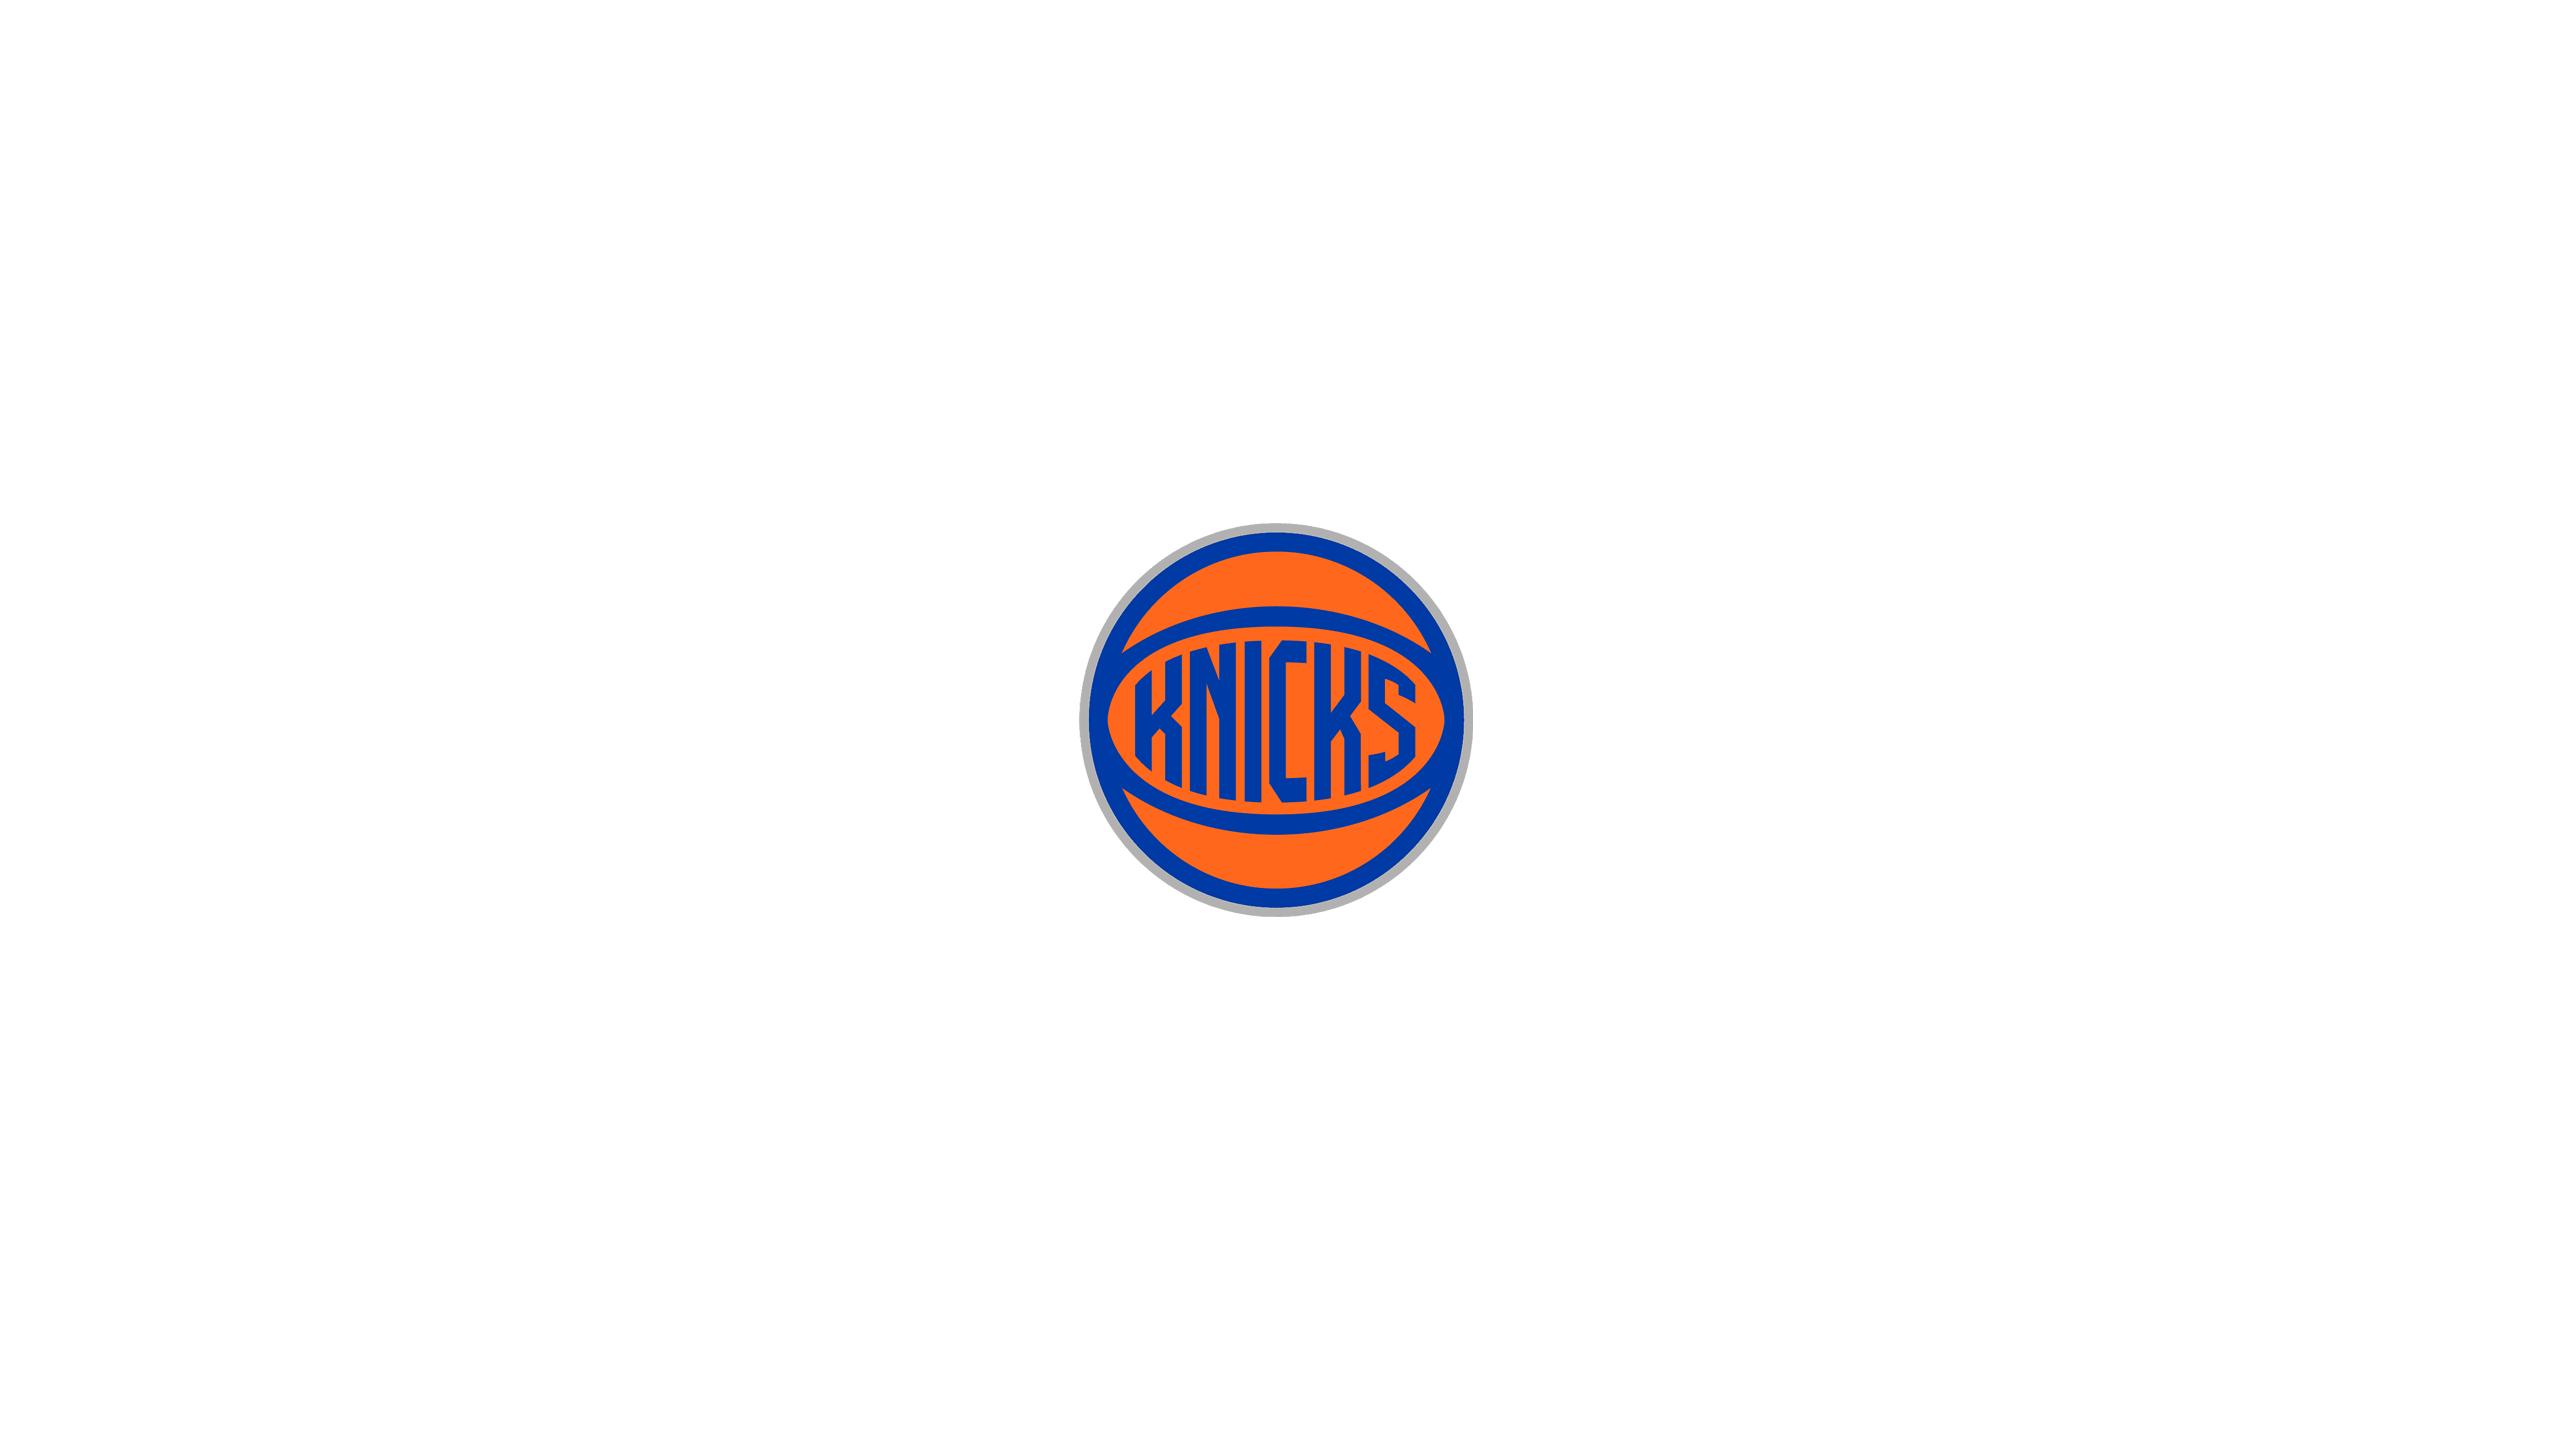 New York Knicks (Old School)